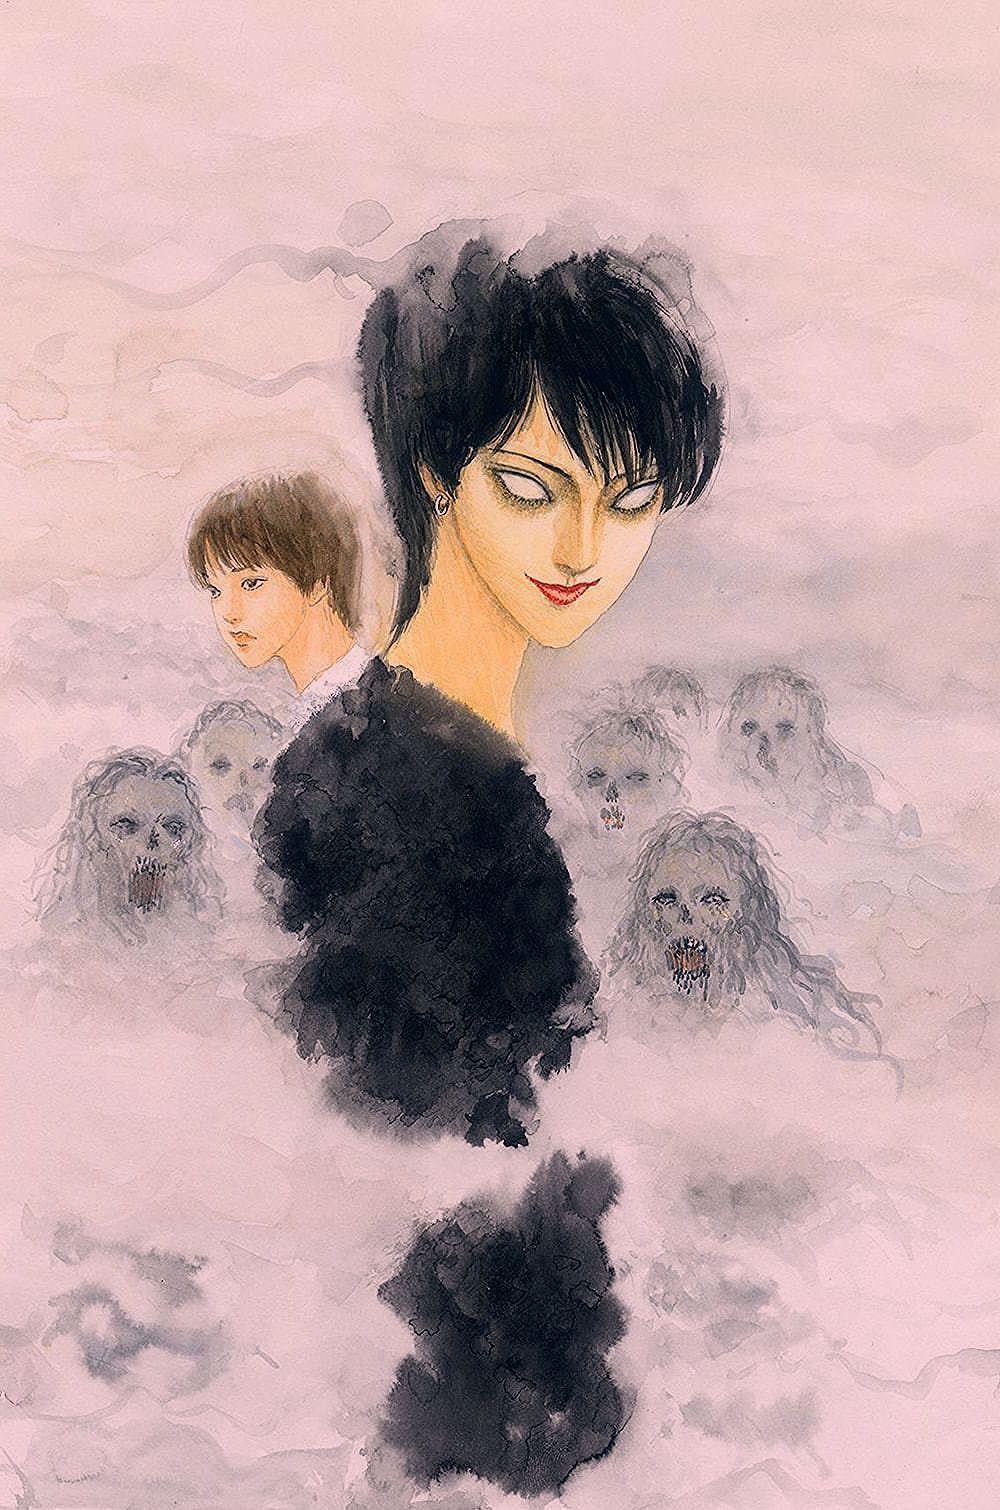 Art by junji ito in 2020 art junji ito anime